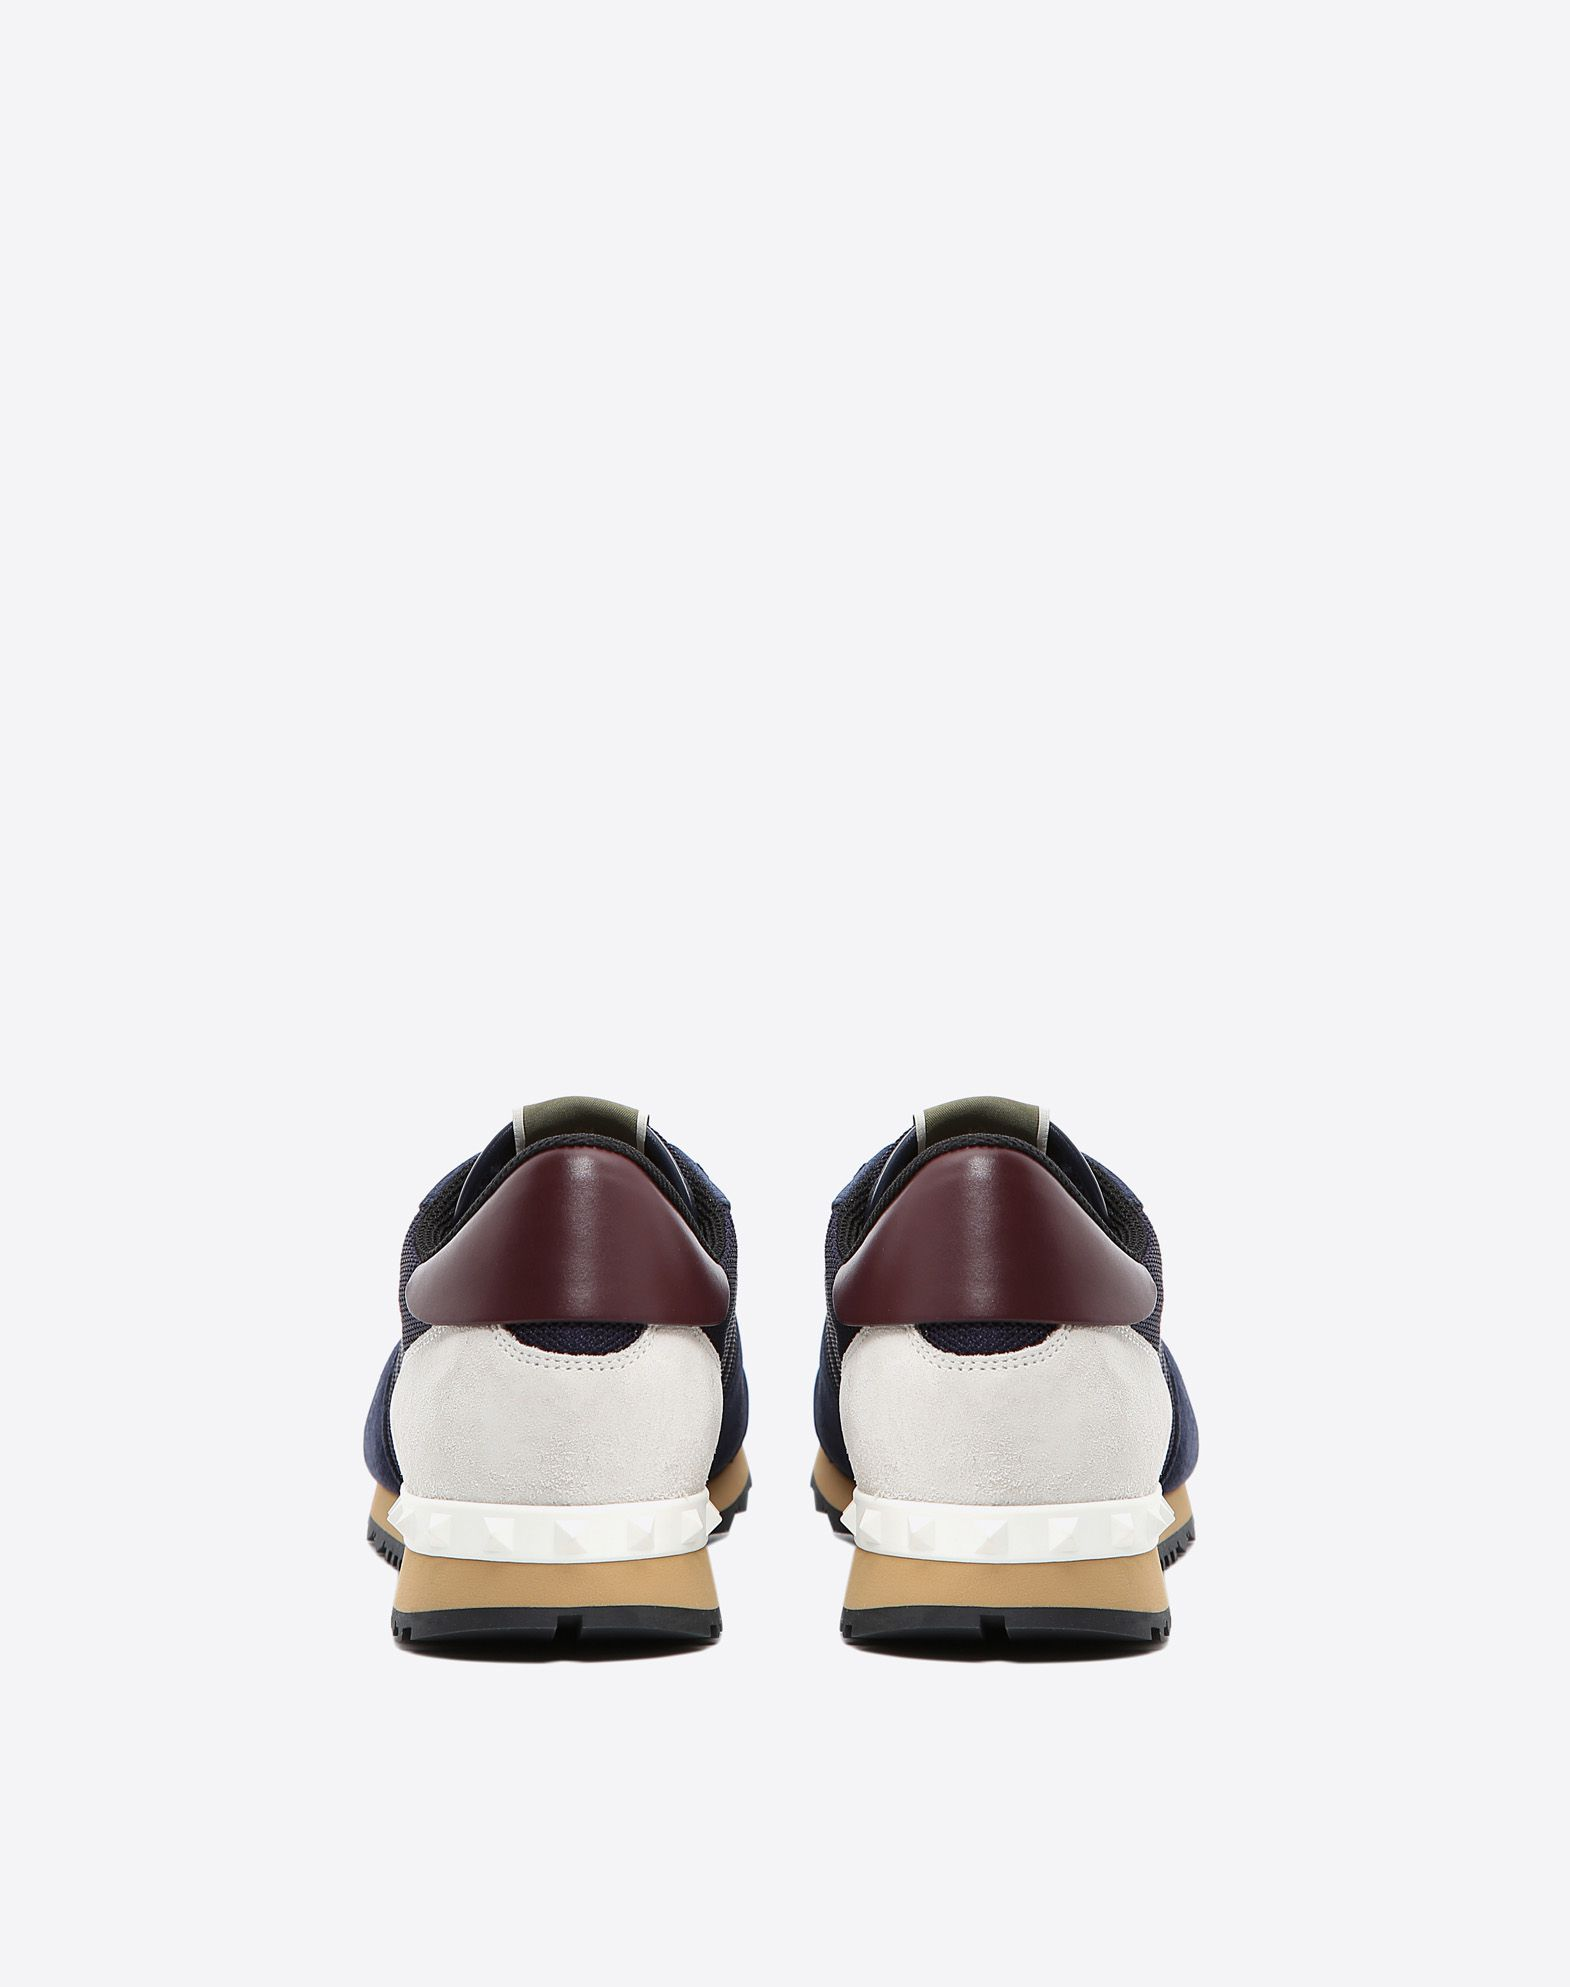 VALENTINO GARAVANI UOMO MY2S0723TCV H07 Sneaker U d